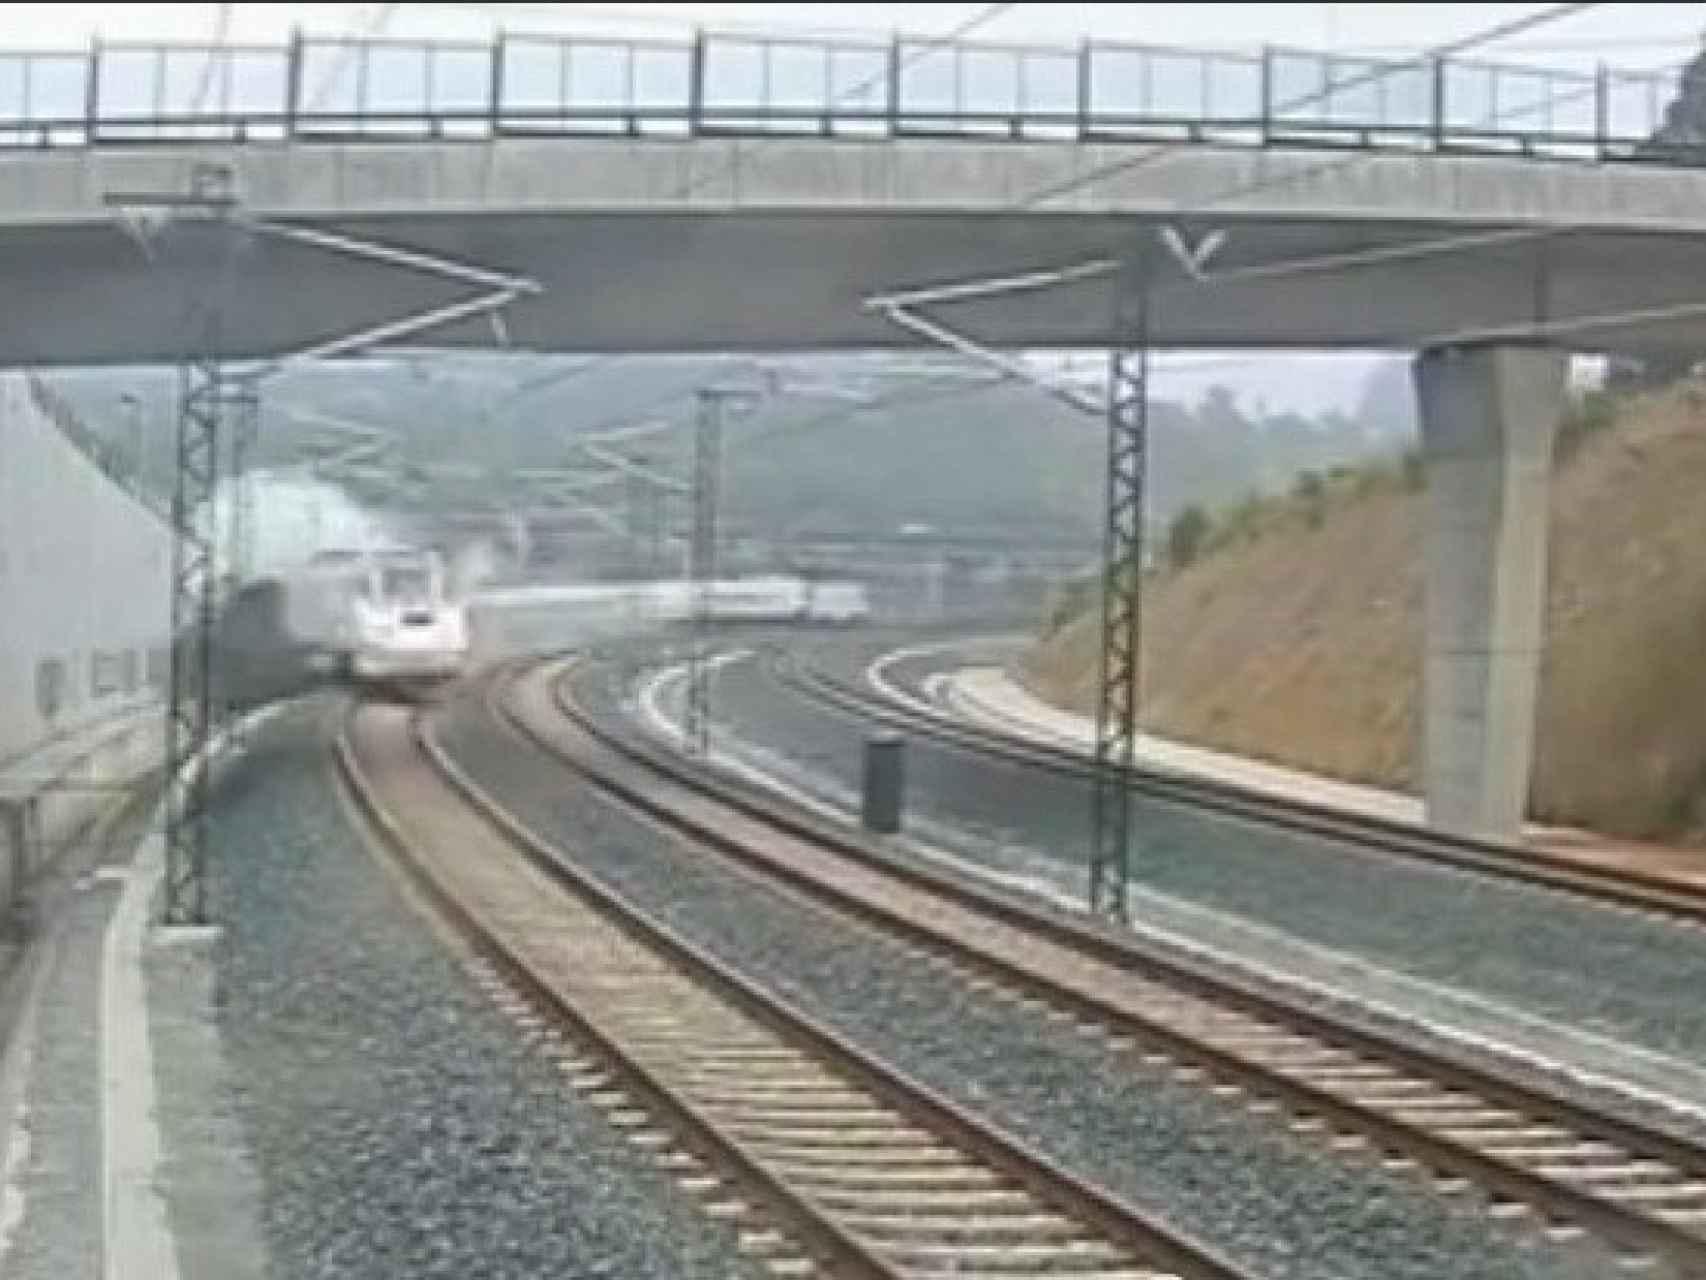 Captura 10 del vídeo del accidente del tren Alvia 730